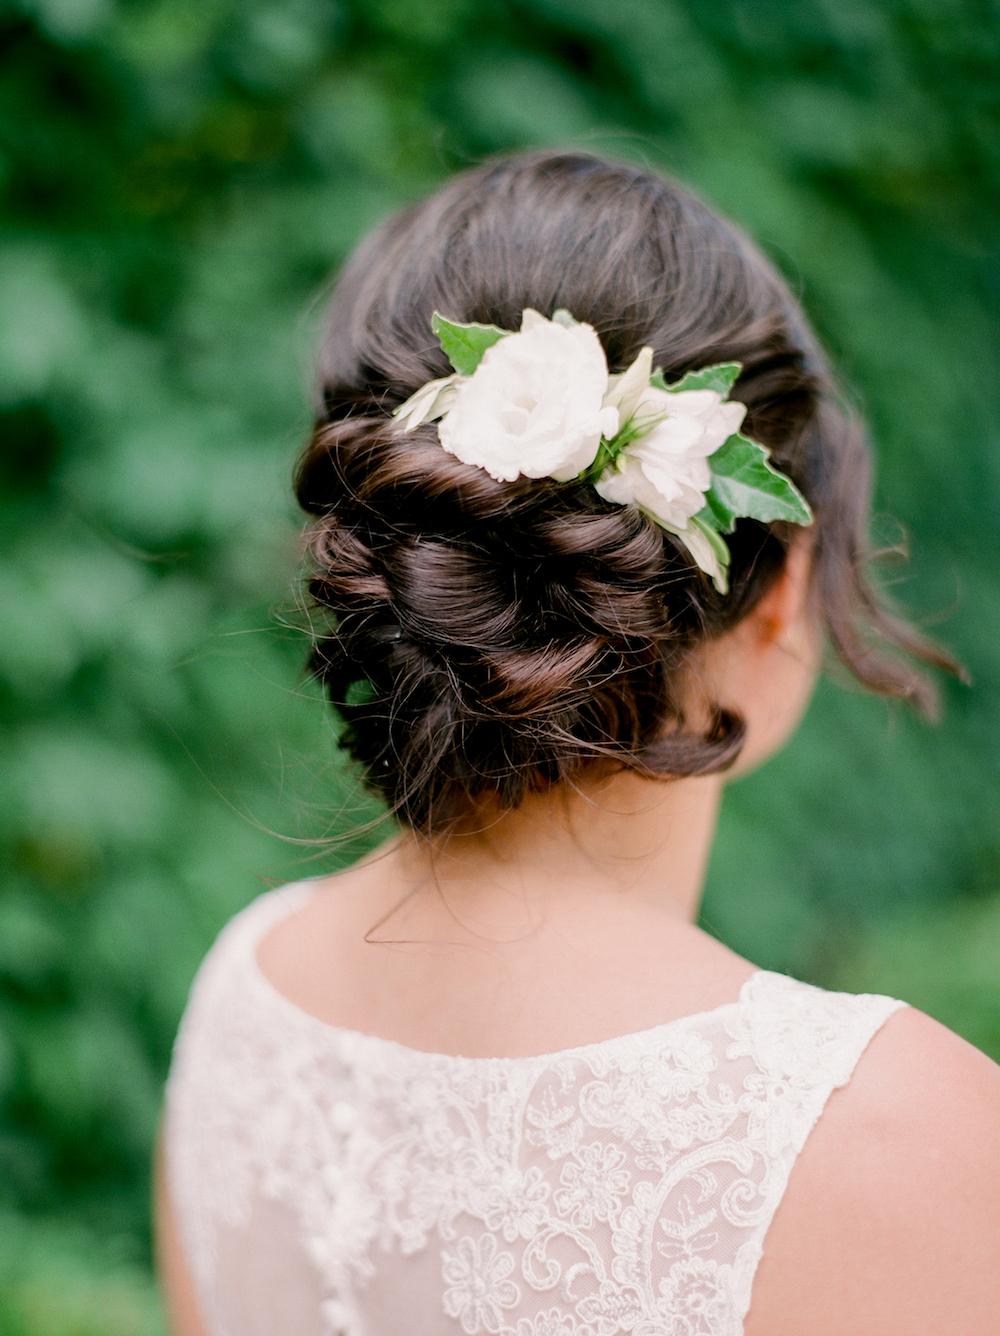 Bridal Floral Comb - Wedding Florist in WInnipeg